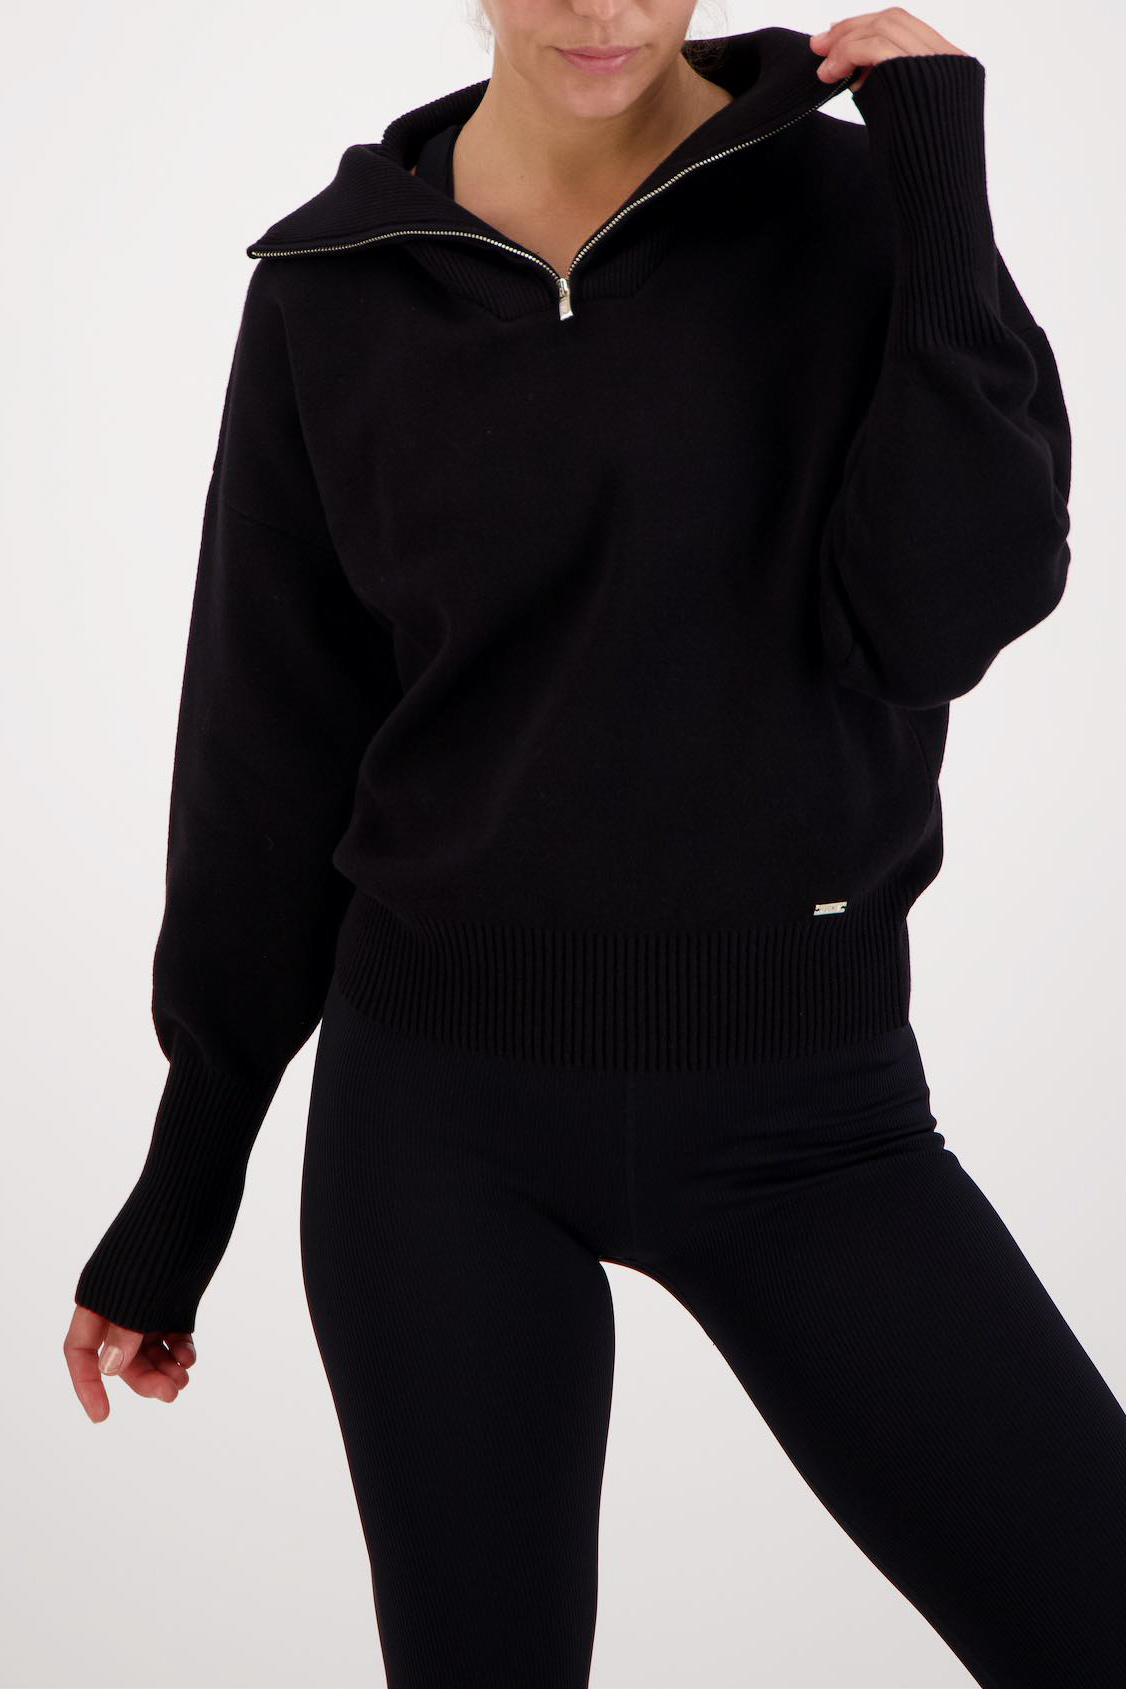 Olly Half-Zip Knit Sweater - Black-2